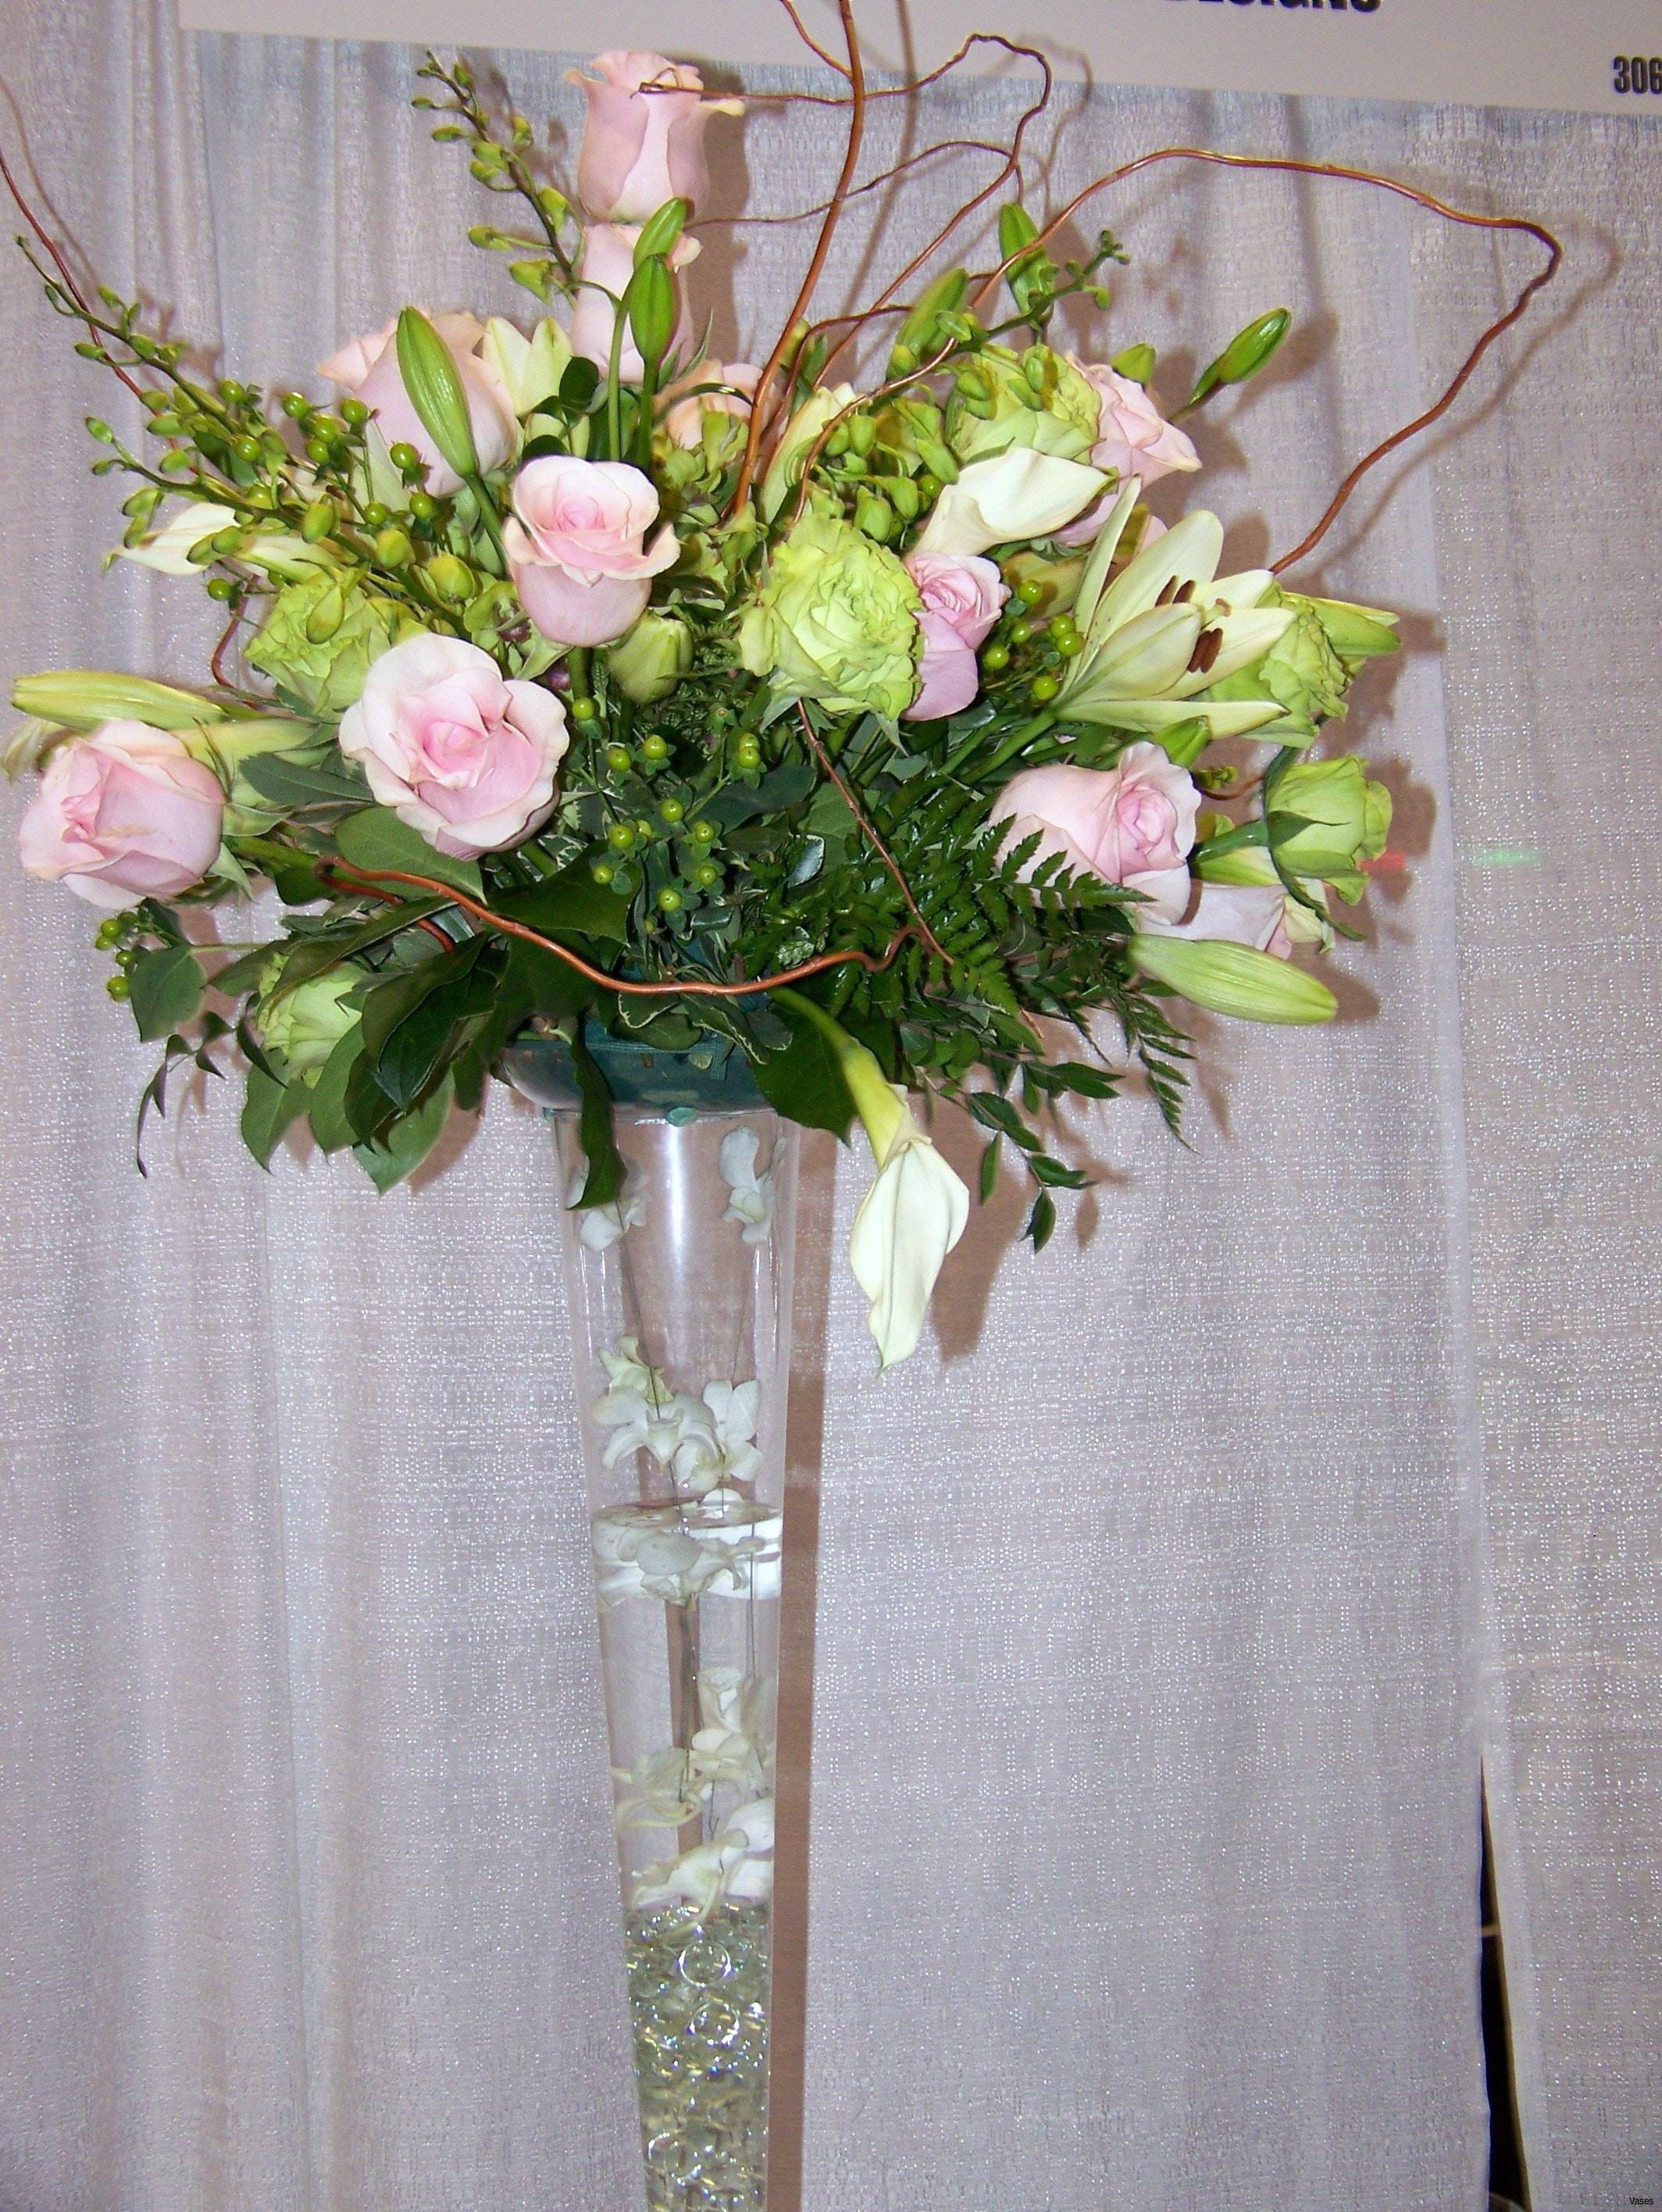 wholesale vases miami of uncategorized floral arrangement inspiration inside flower arrangement needs lovely h vases ideas for floral arrangements in i 0d design ideas design